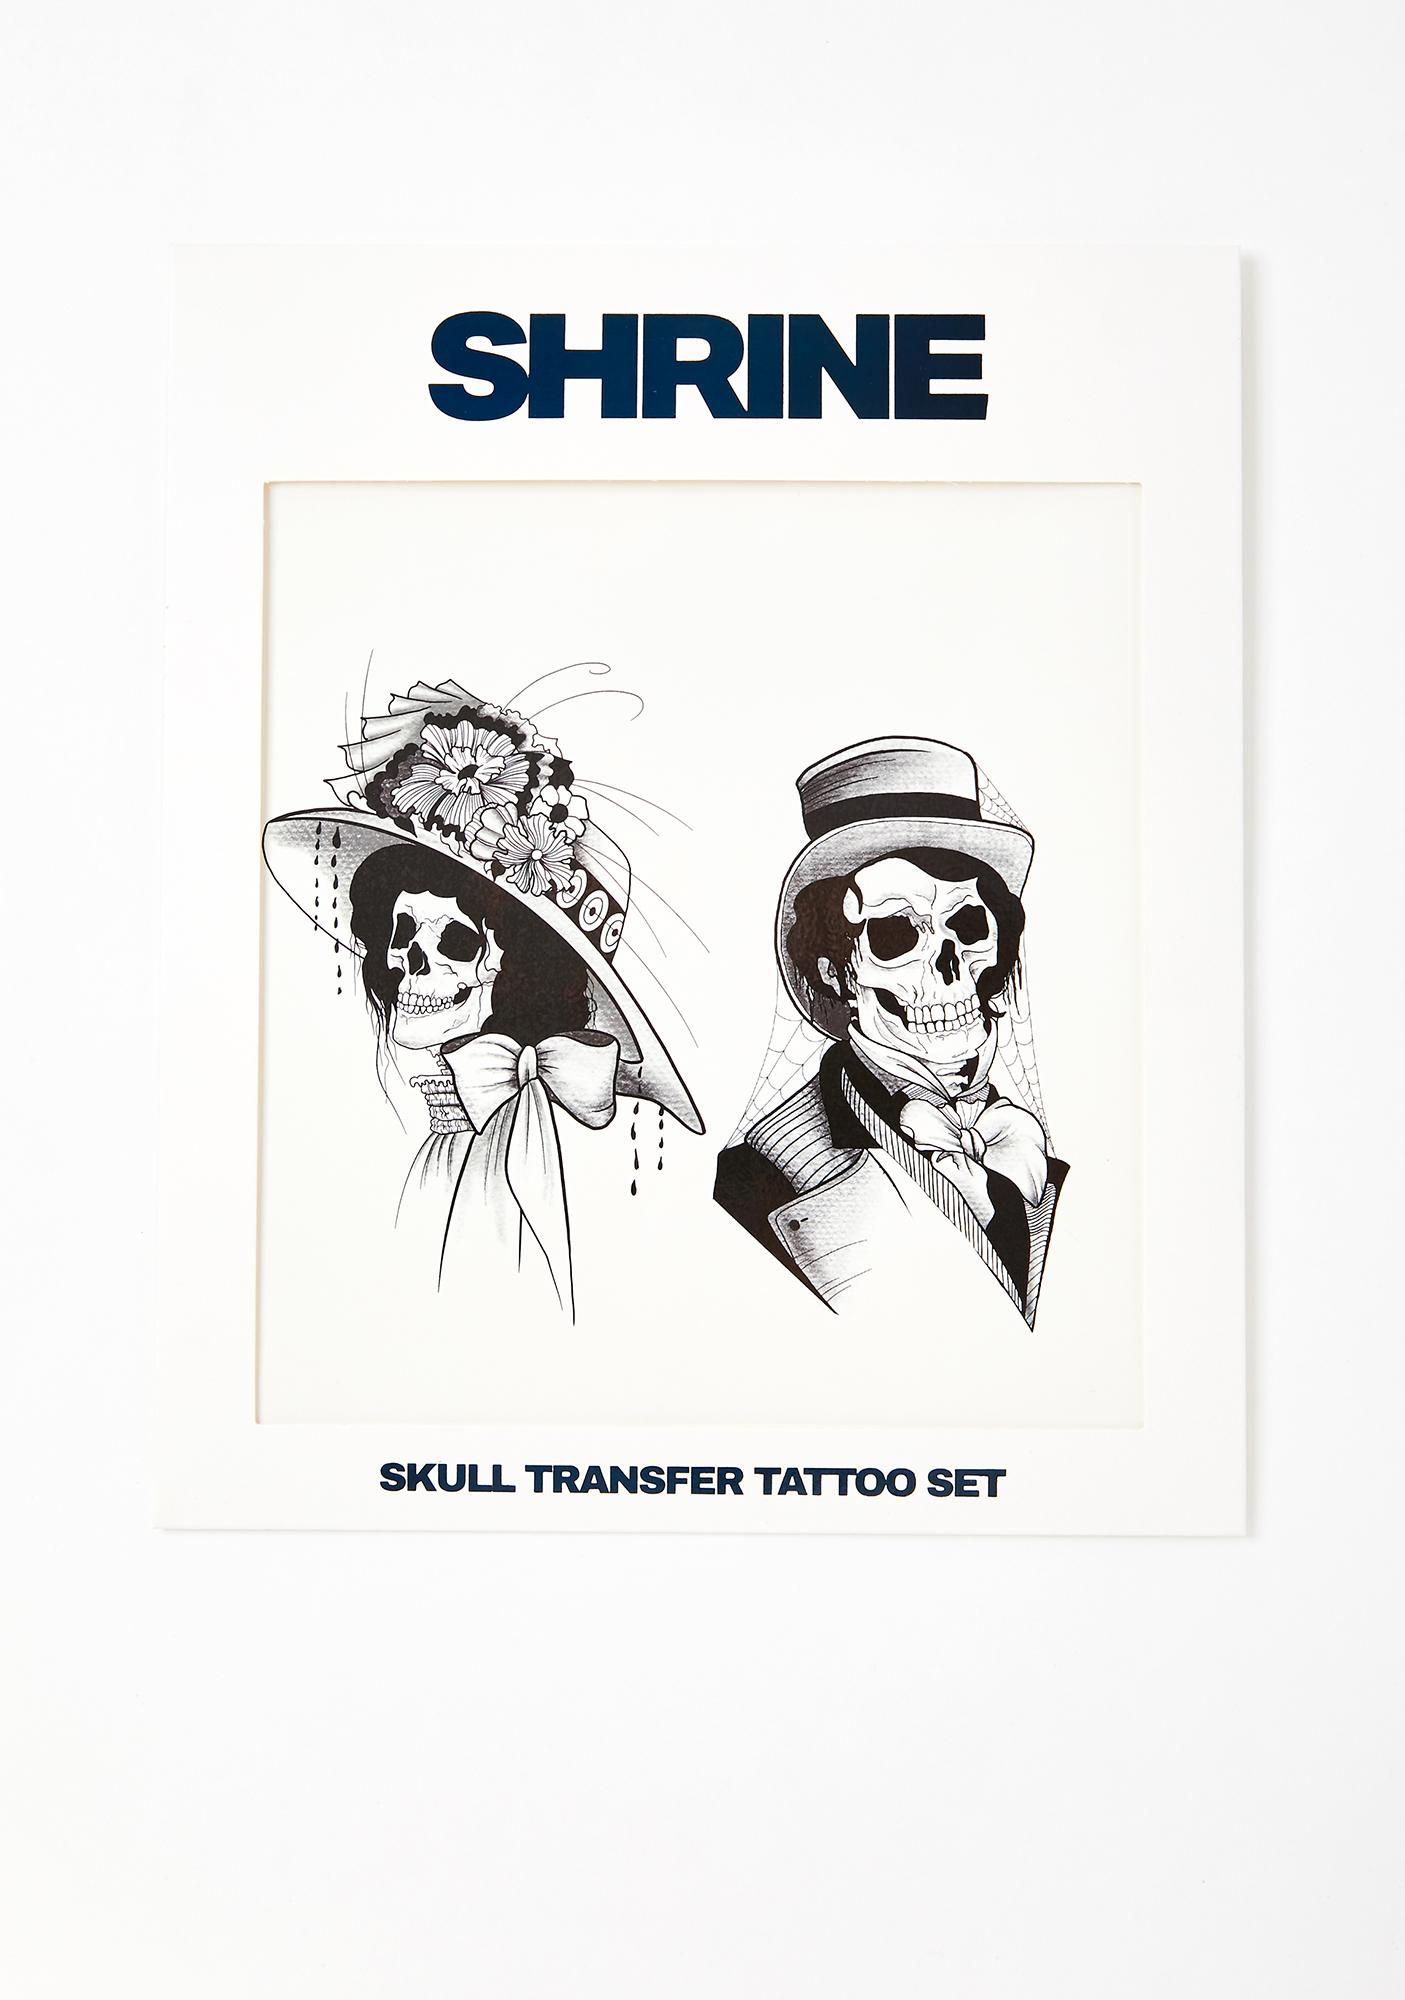 SHRINE Skull Transfer Tattoo Set